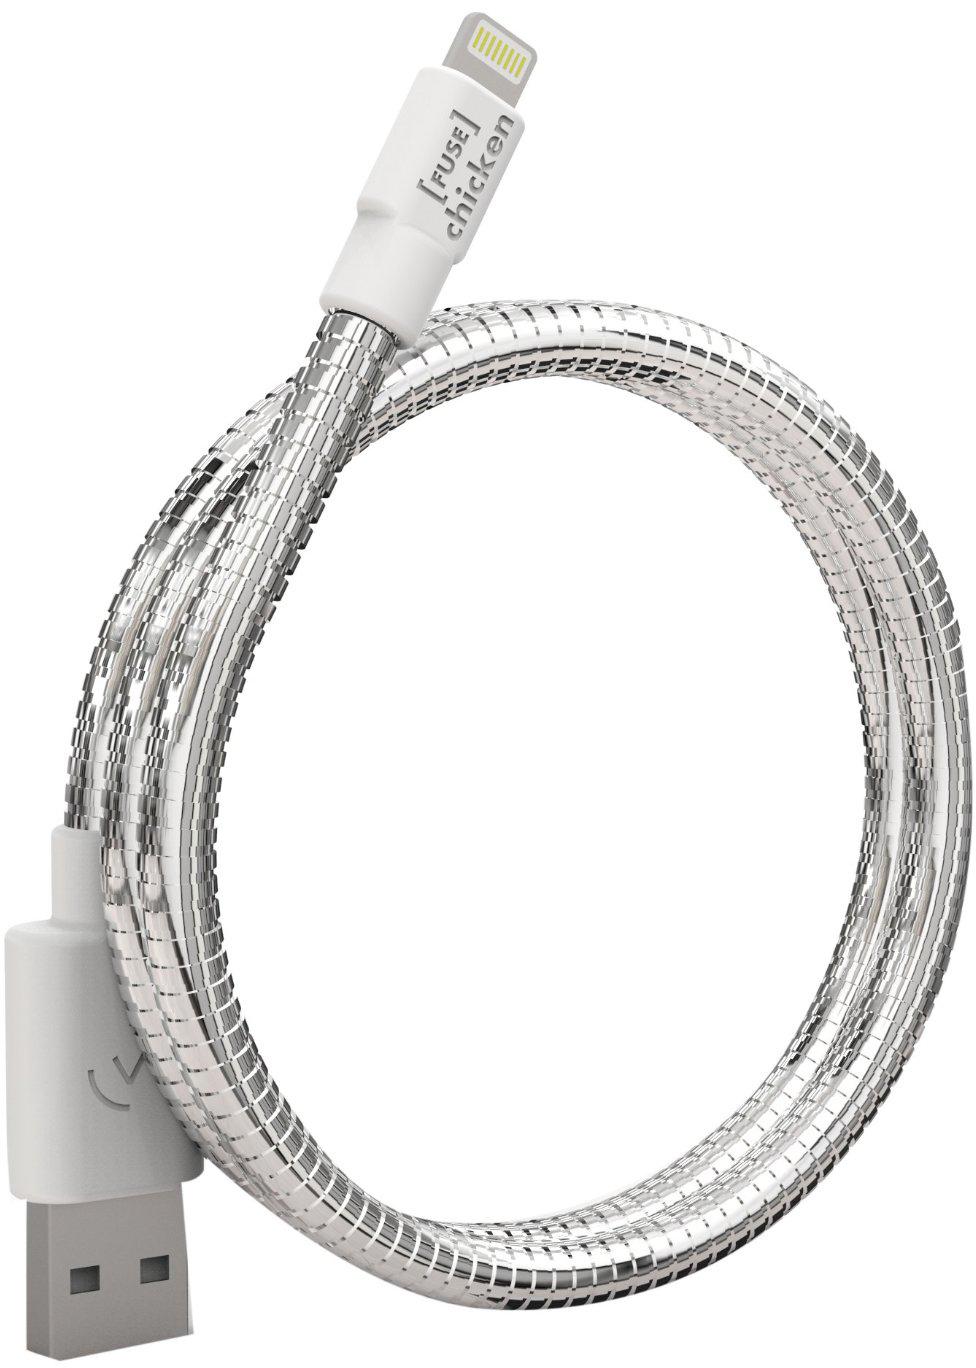 Fuse Chicken Titan Travel (IHC-100) - кабель Lightning (Silver)